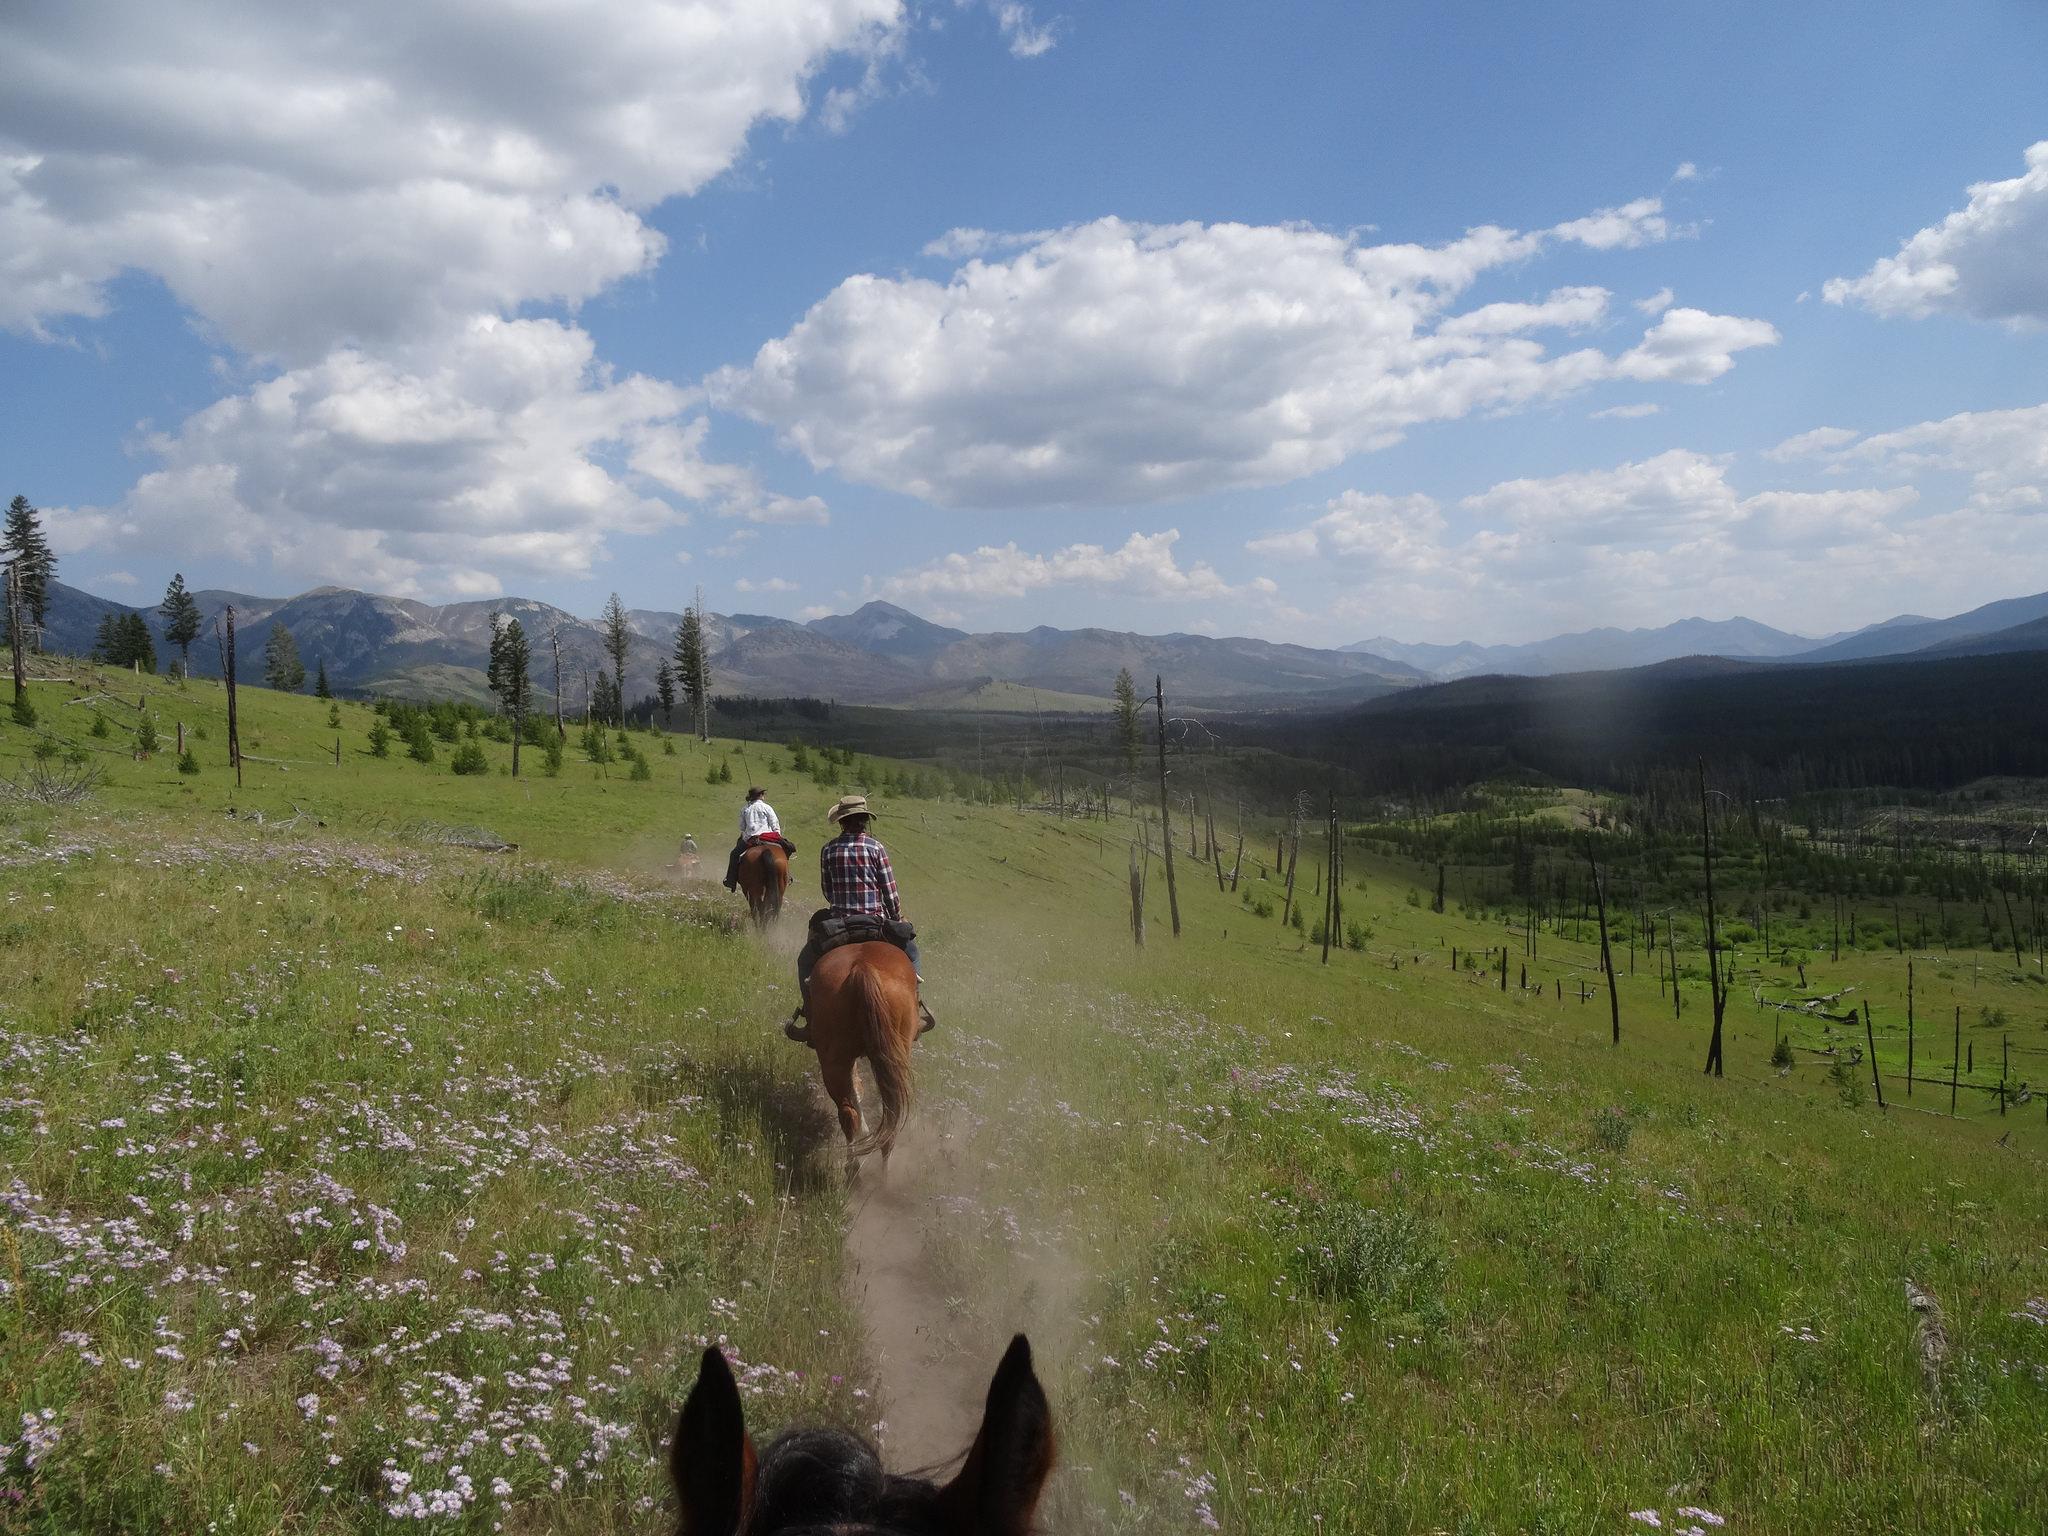 Riding through the Bob Marshall Wilderness